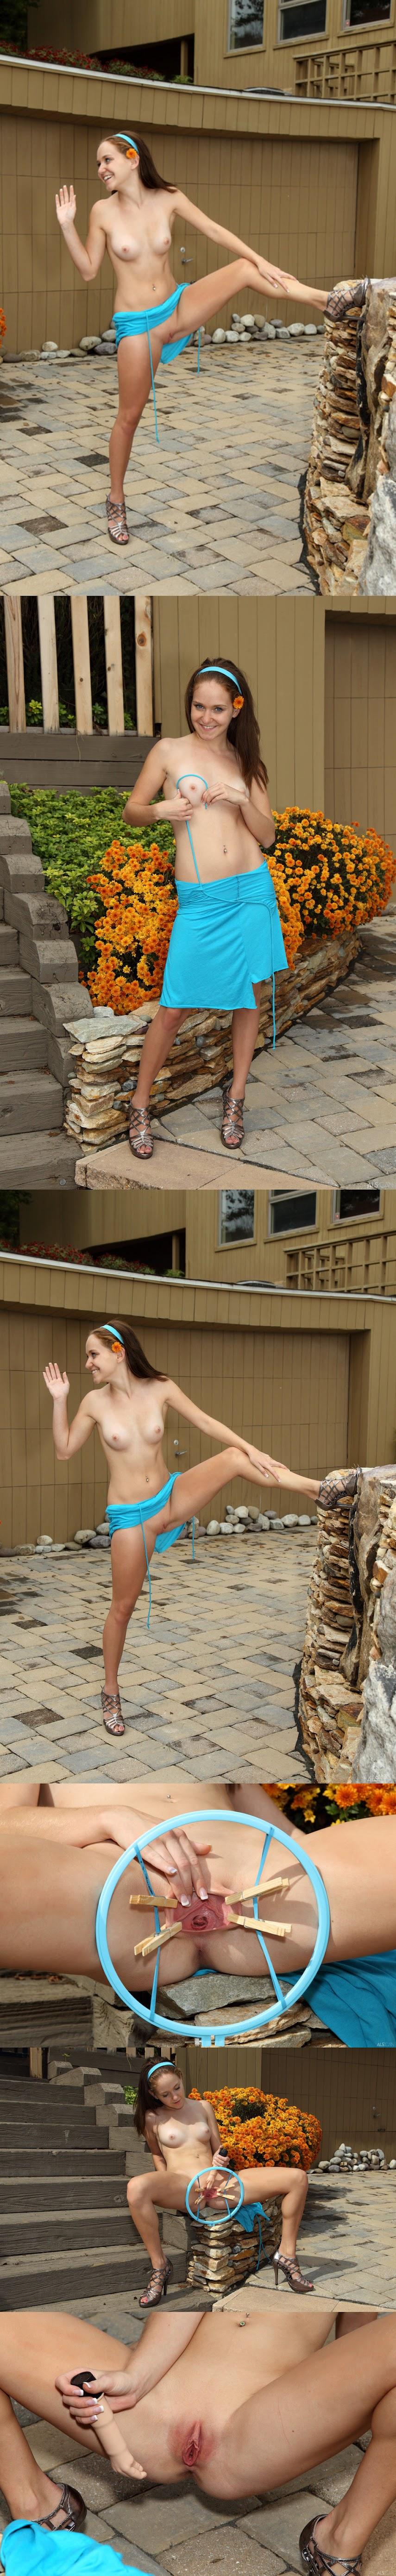 AXLS  2011-04-12 DREAM-SNATCHER-SADIE-GREY-by-ALS-PHOTOGRAPHER d4f49 highReal Street Angels